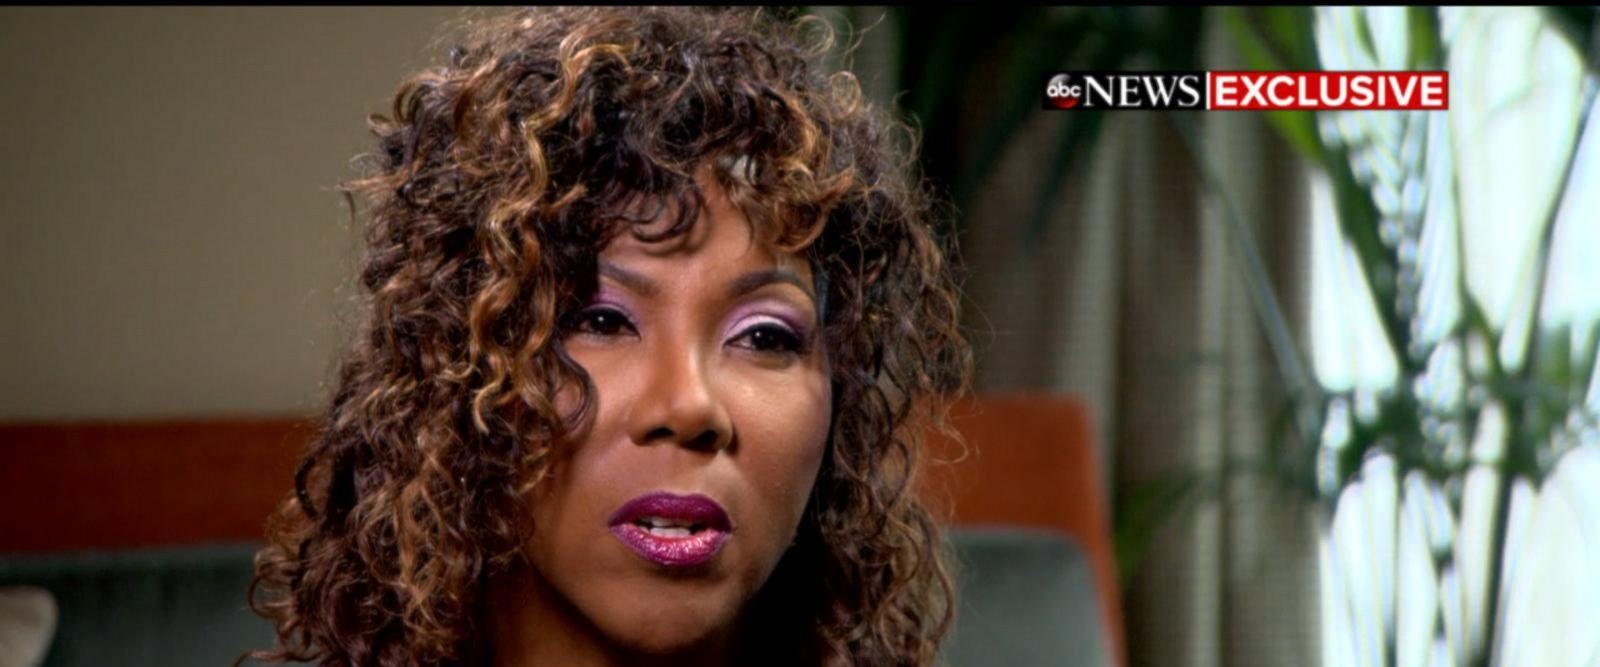 VIDEO: As multiple patients sue, 'Dancing Doctor' defends videos